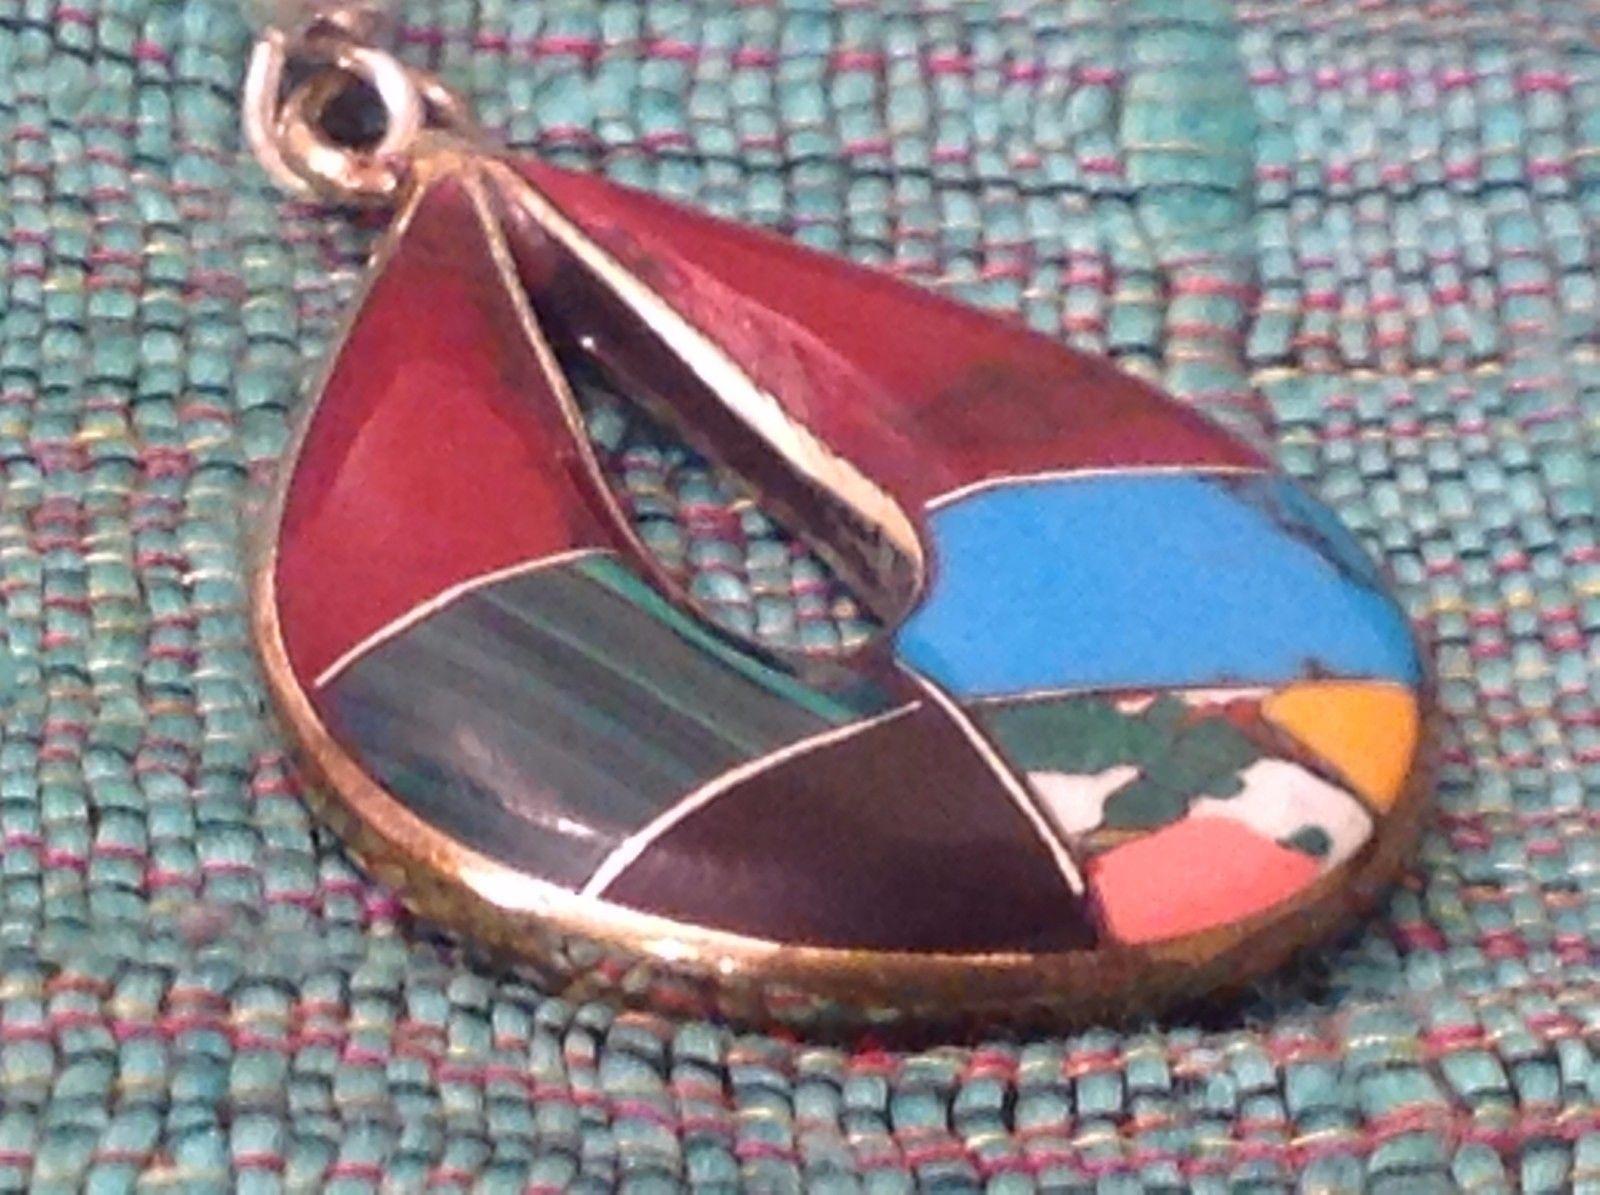 Earrings Artisanal Silver with inlay teardrop turquoise Carnelian Onyx